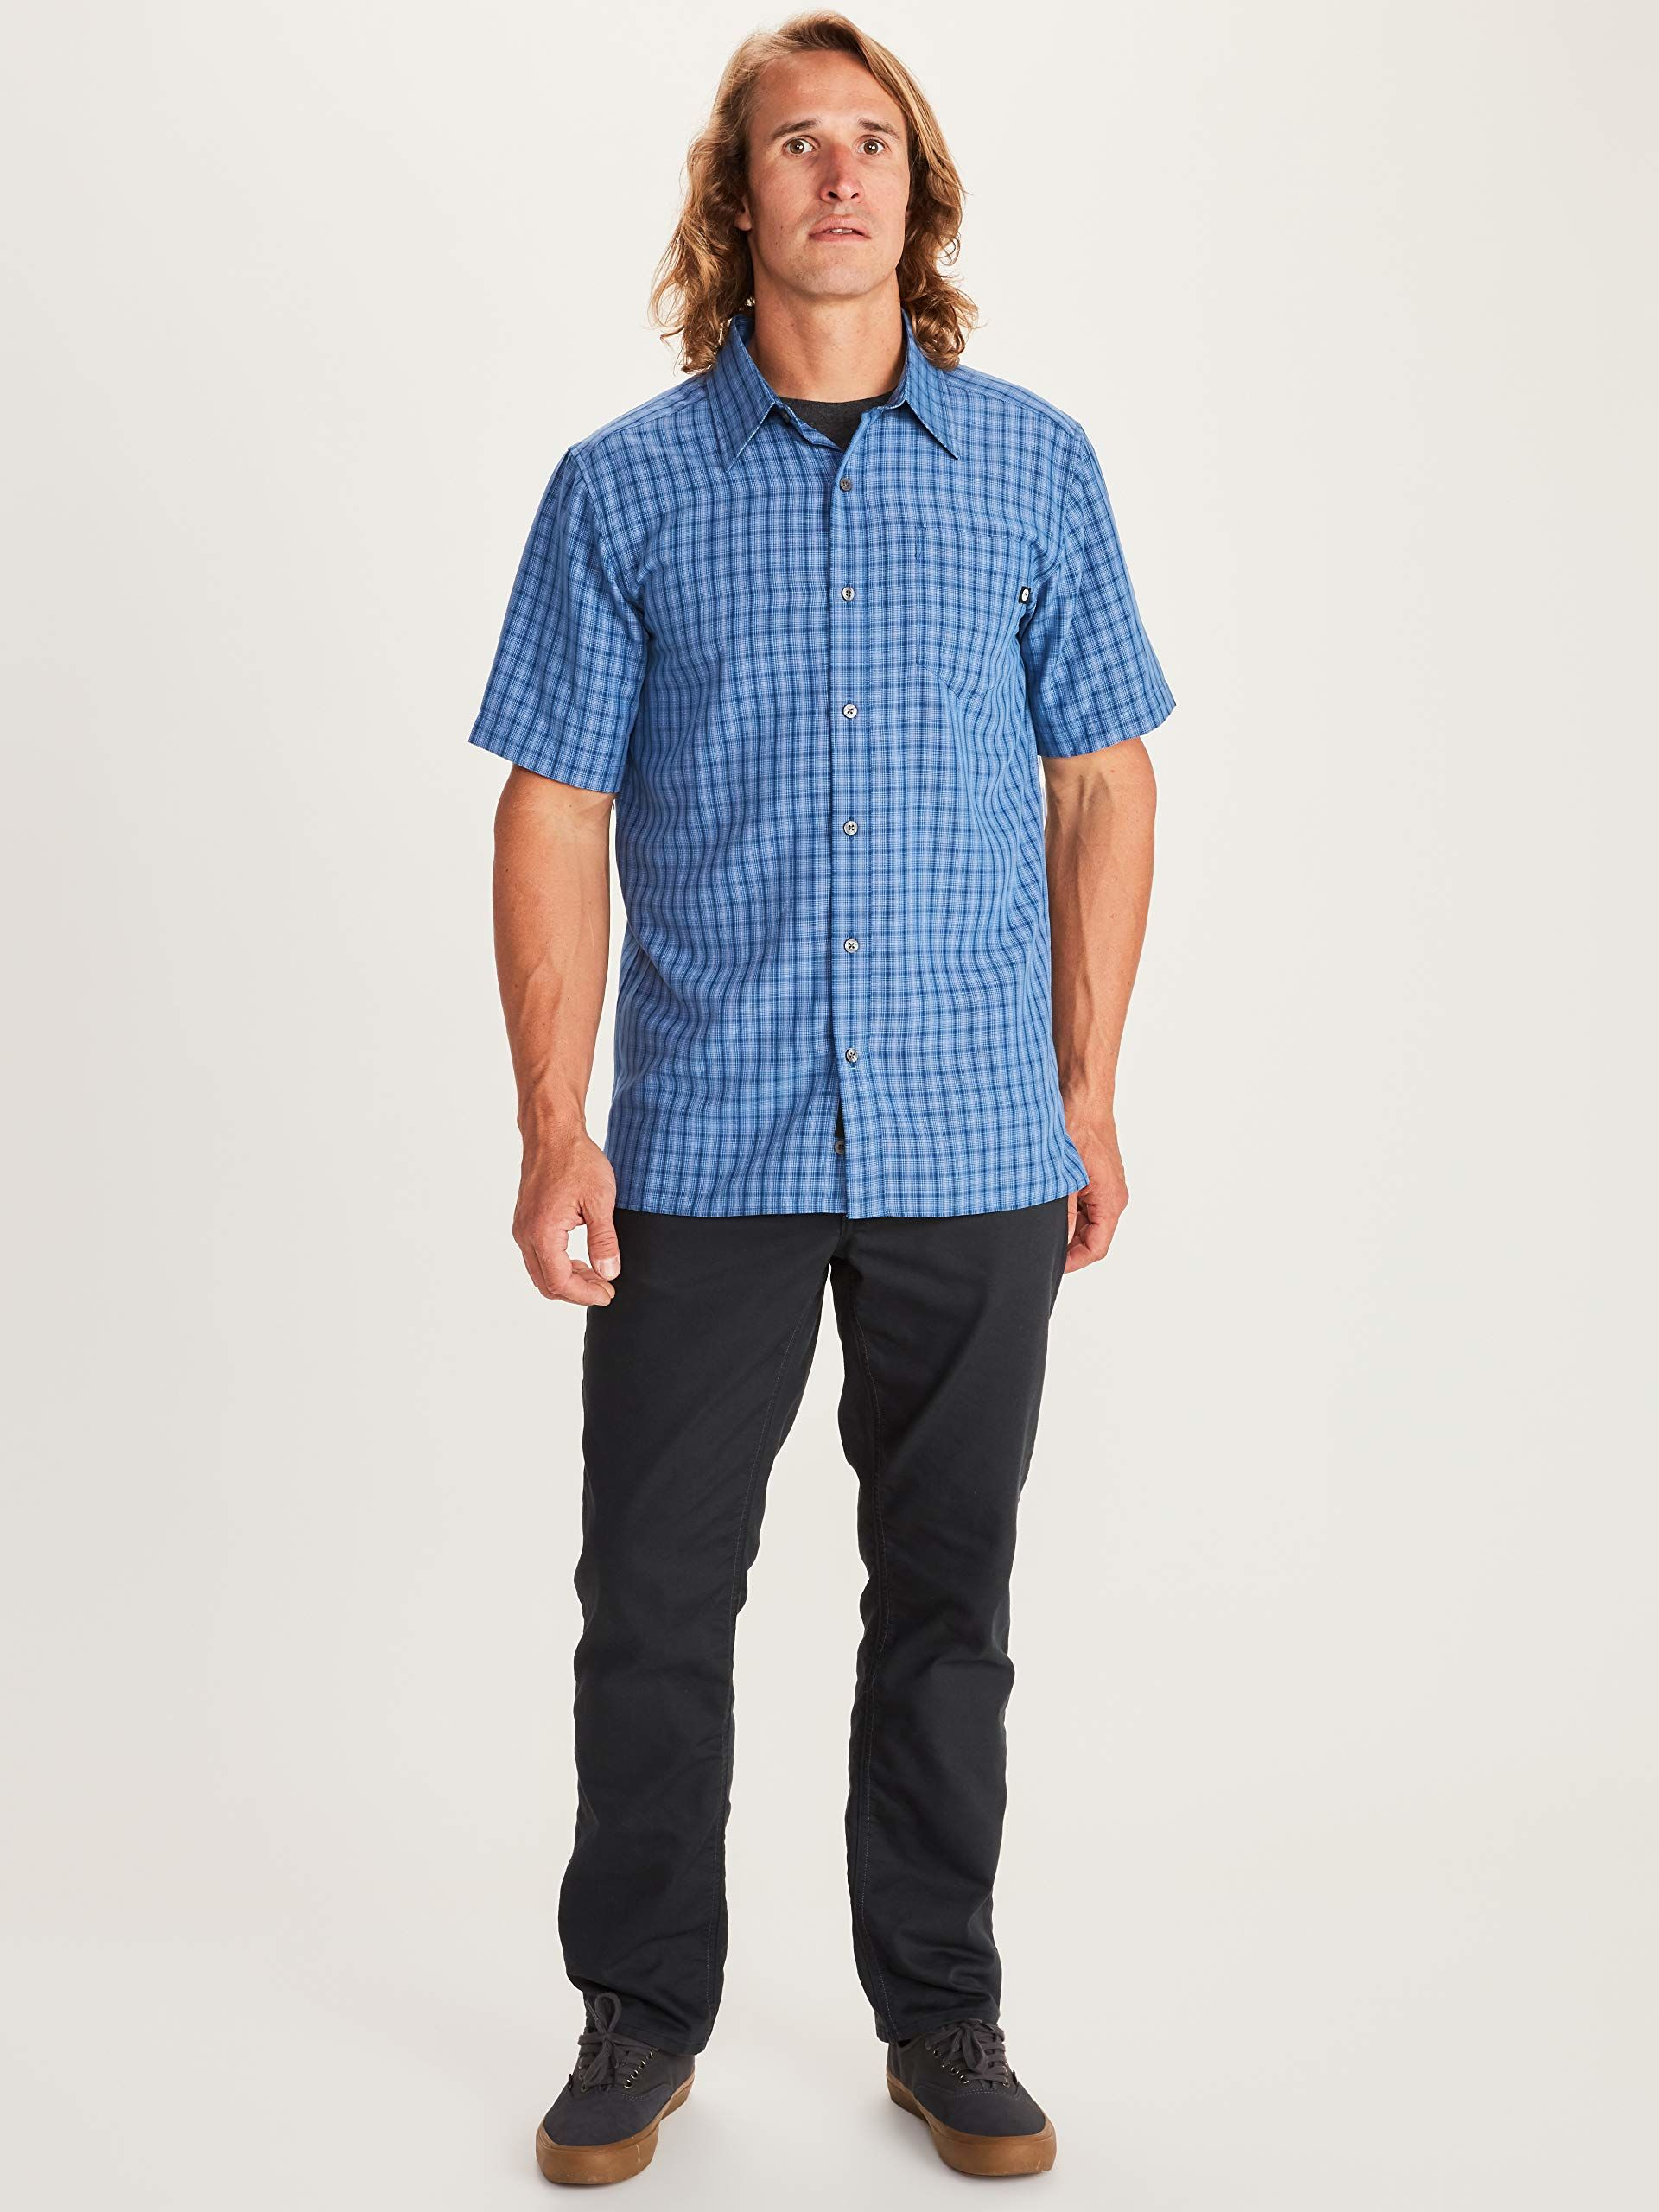 Marmot Eldridge męska koszula z krótkim rękawem niebieski Varsity Blue S